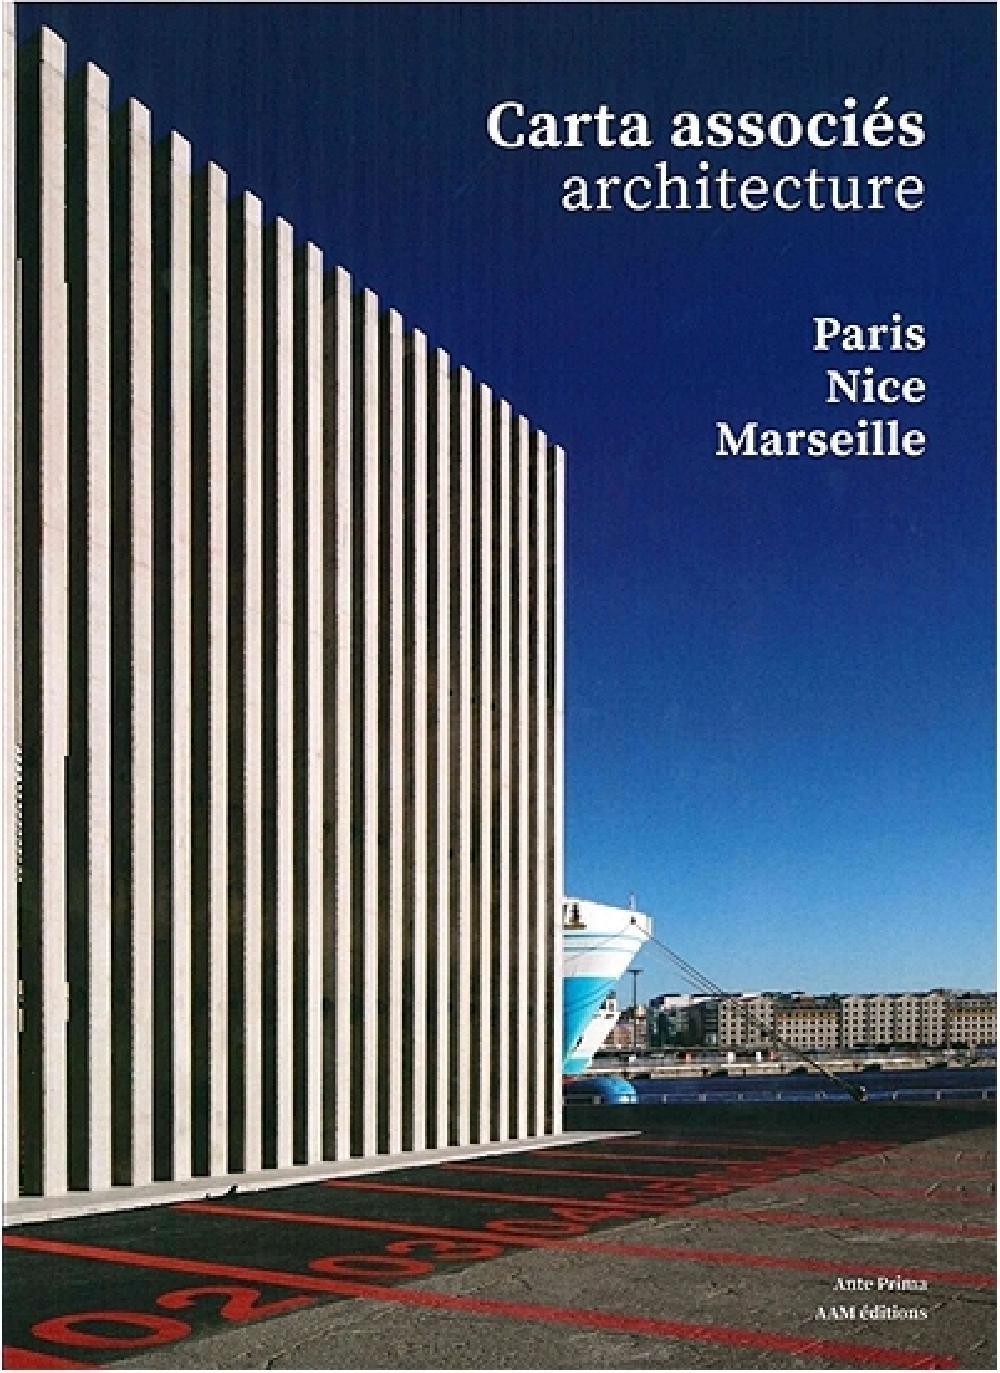 Carta associés architecture - Paris-Nice-Marseille 2014-2020